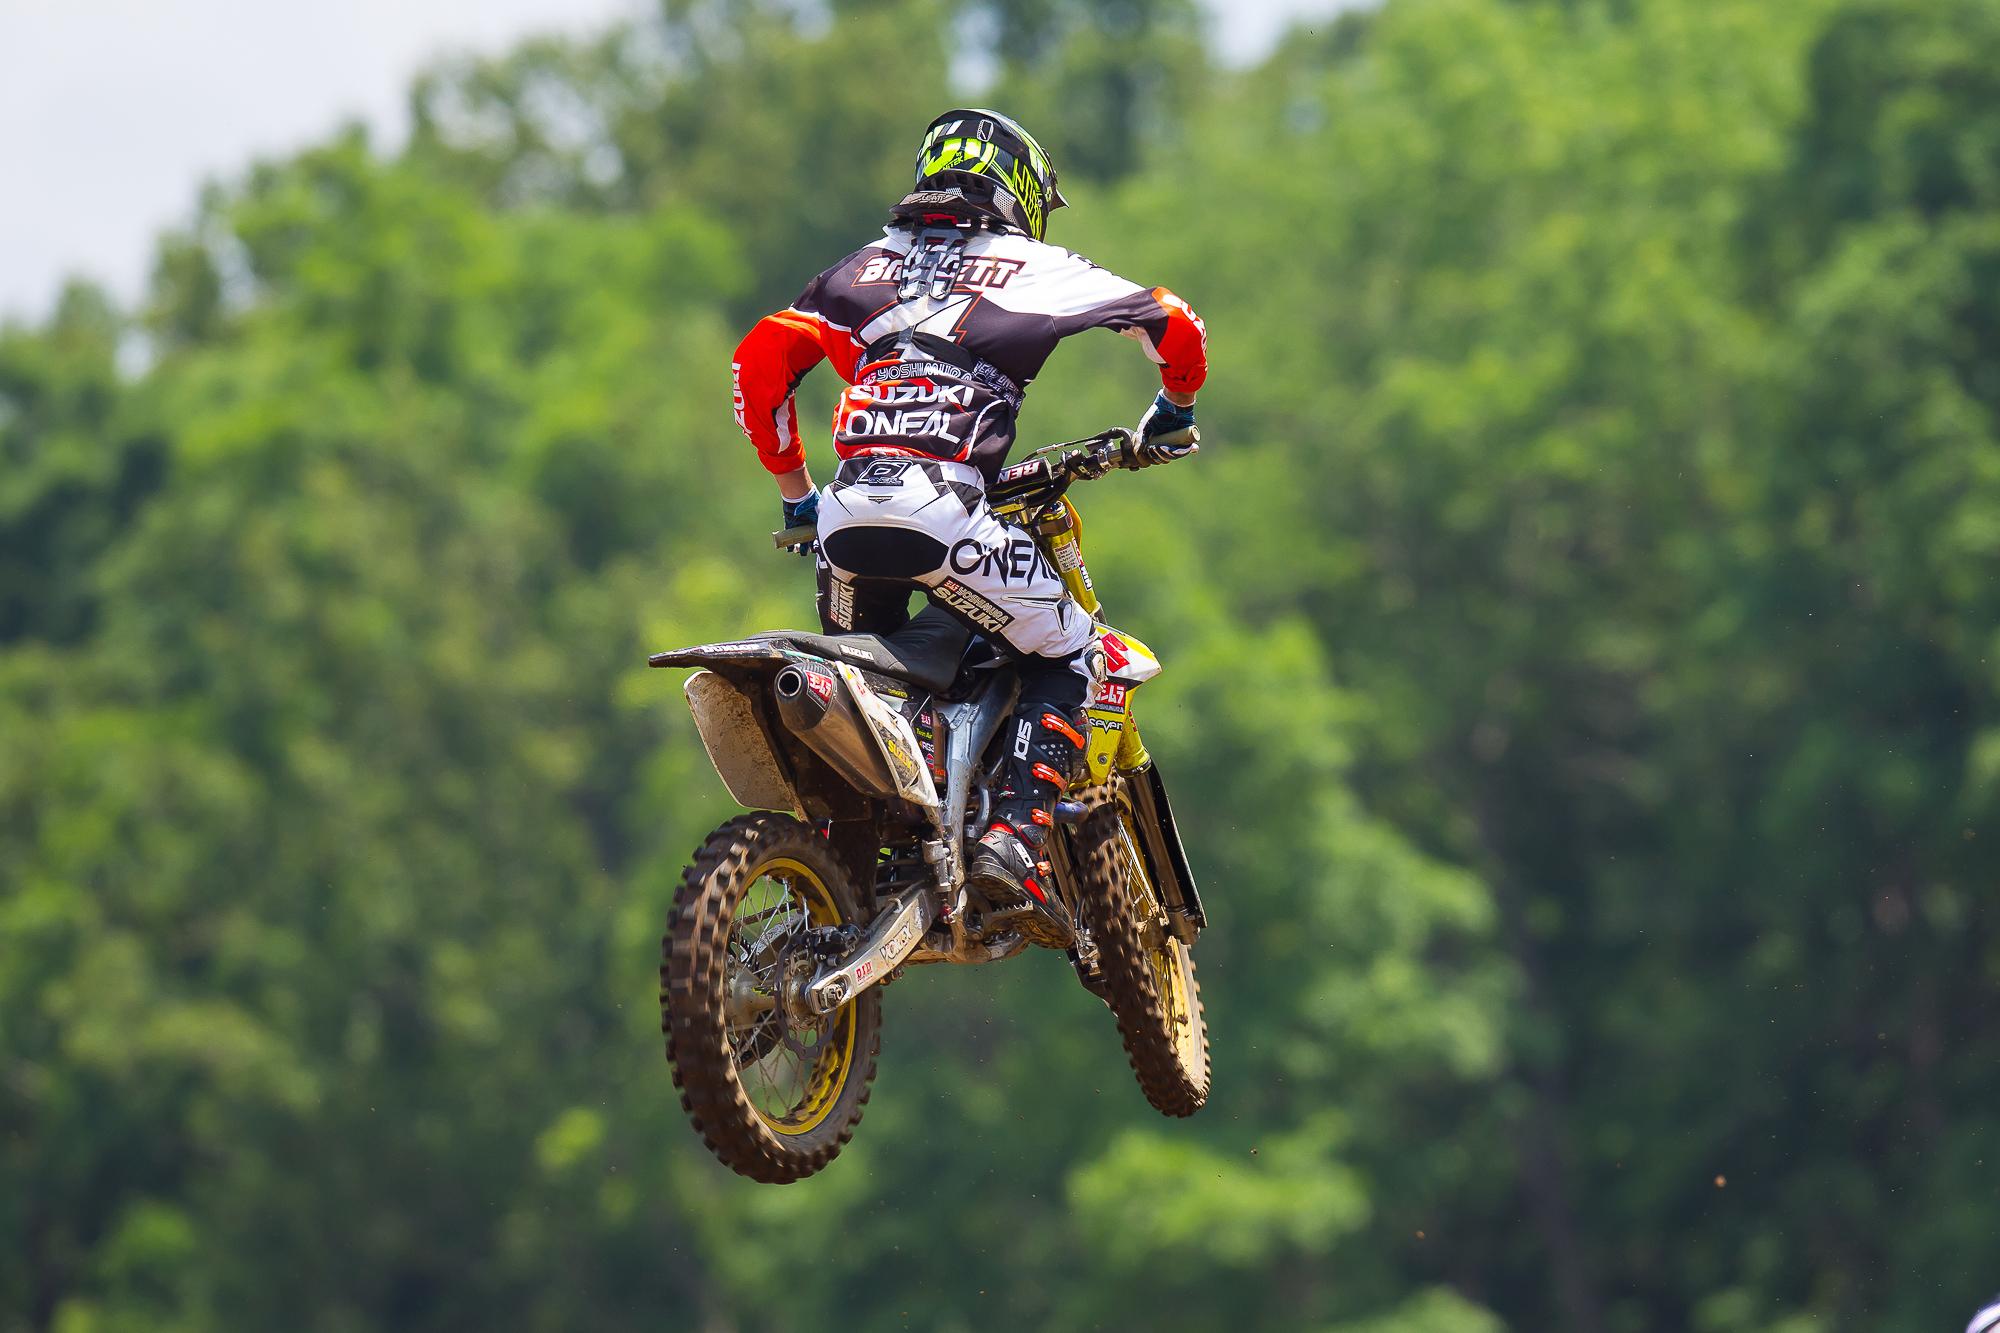 O'NEAL team rider BLAKE BAGGETT TAKES FOURTH AT MUDDY CREEK MOTOCROSS